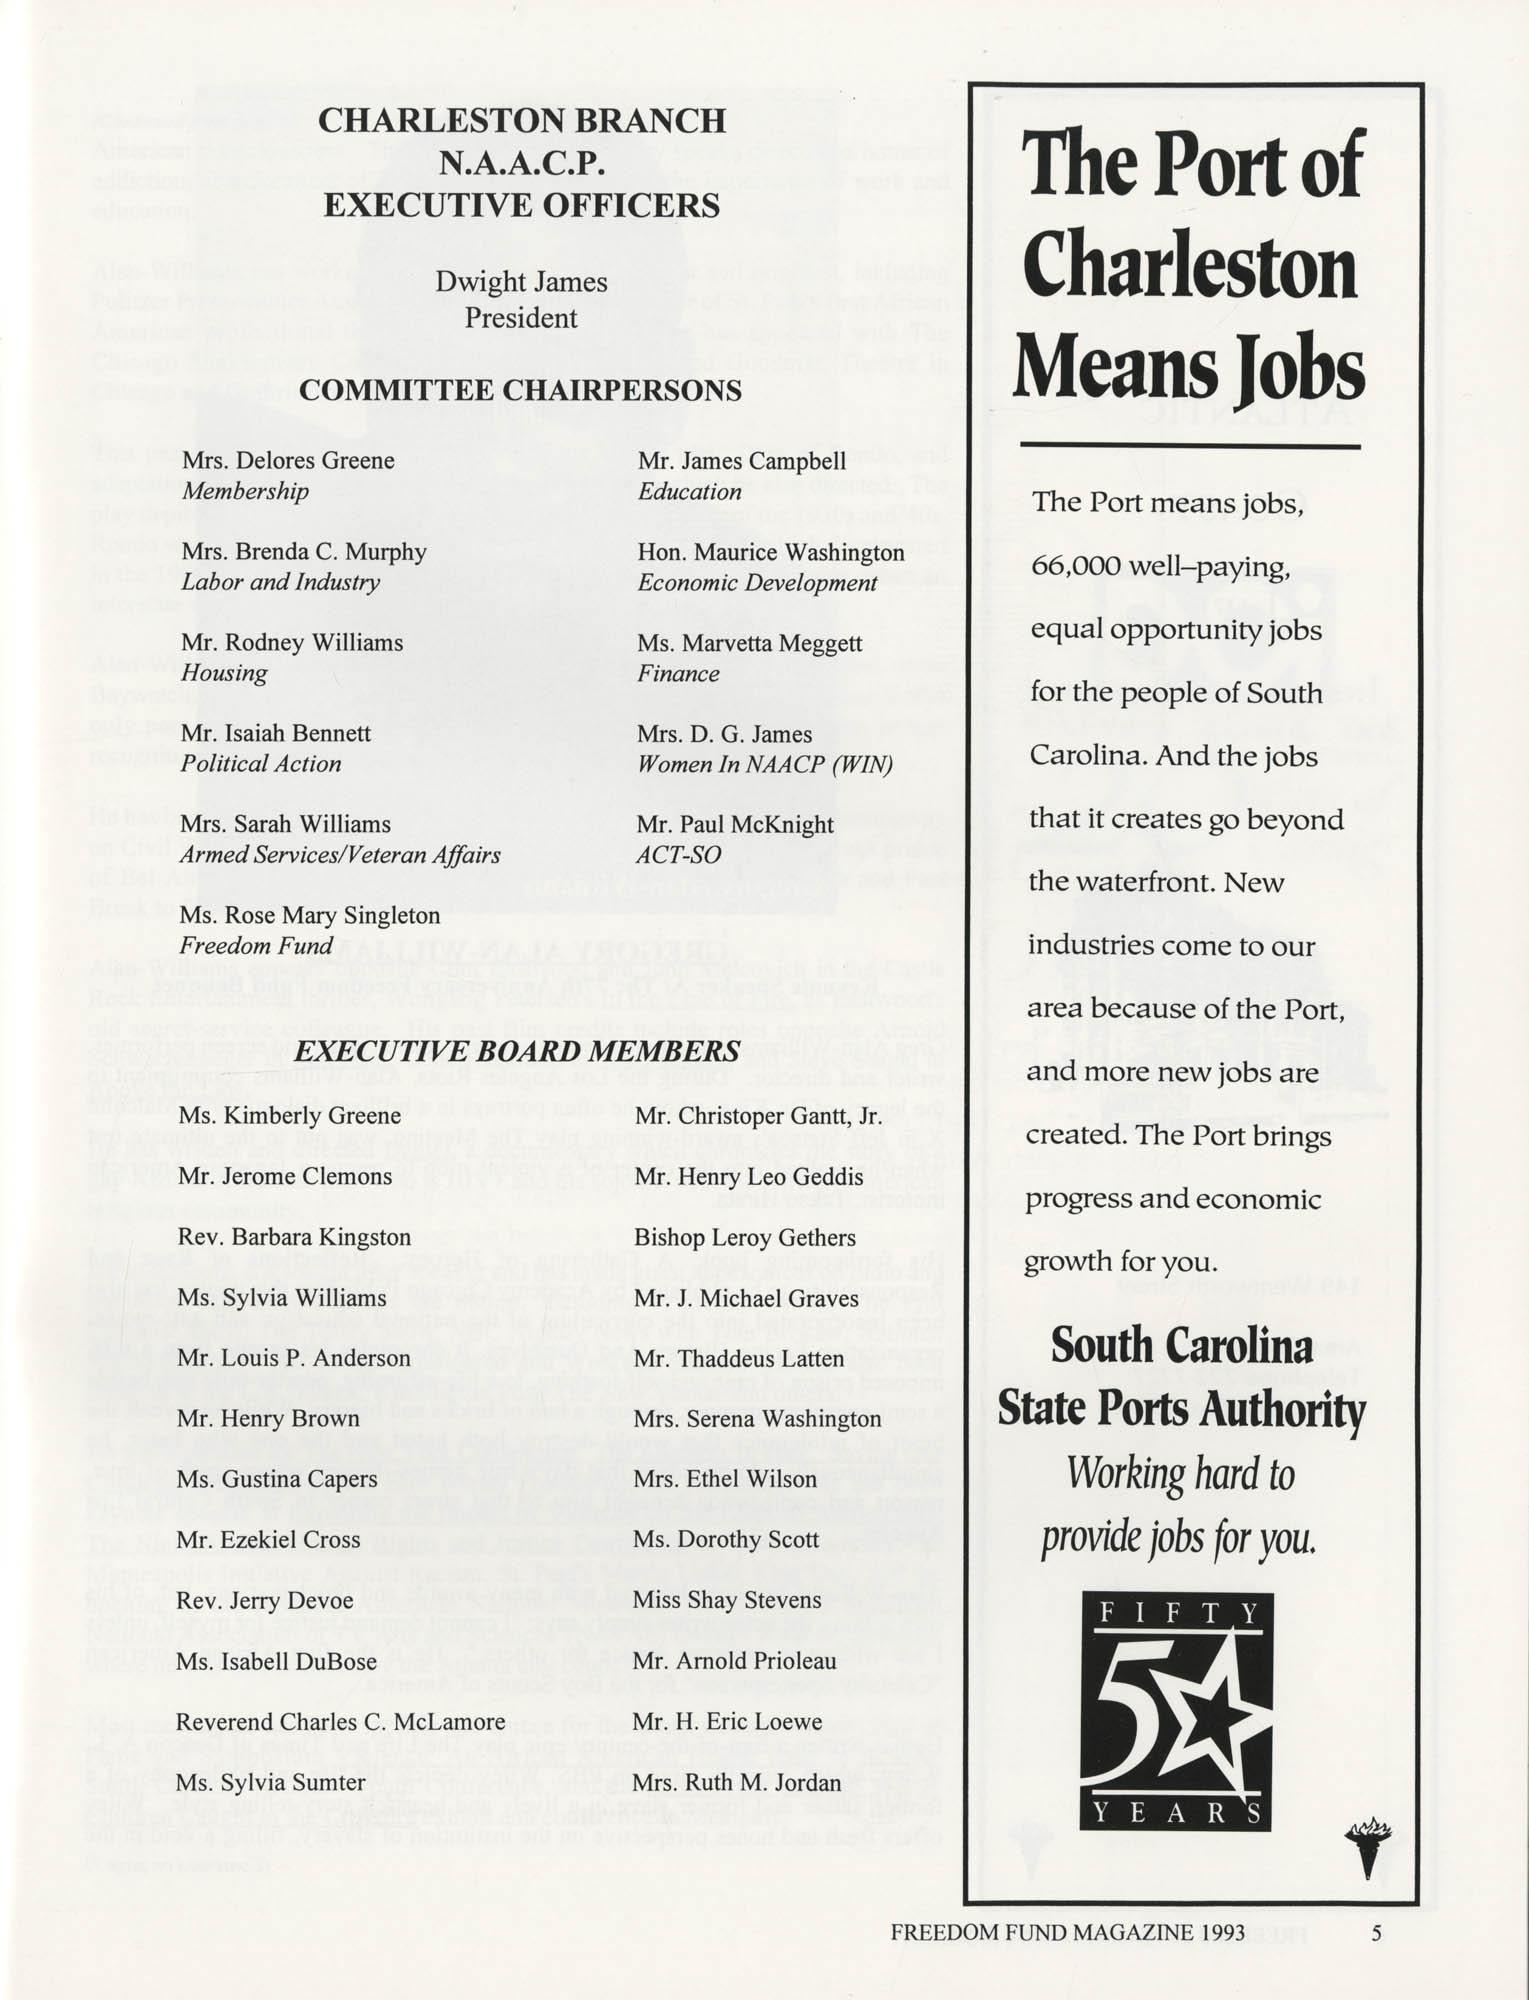 Freedom Fund Magazine, 1993, Page 5